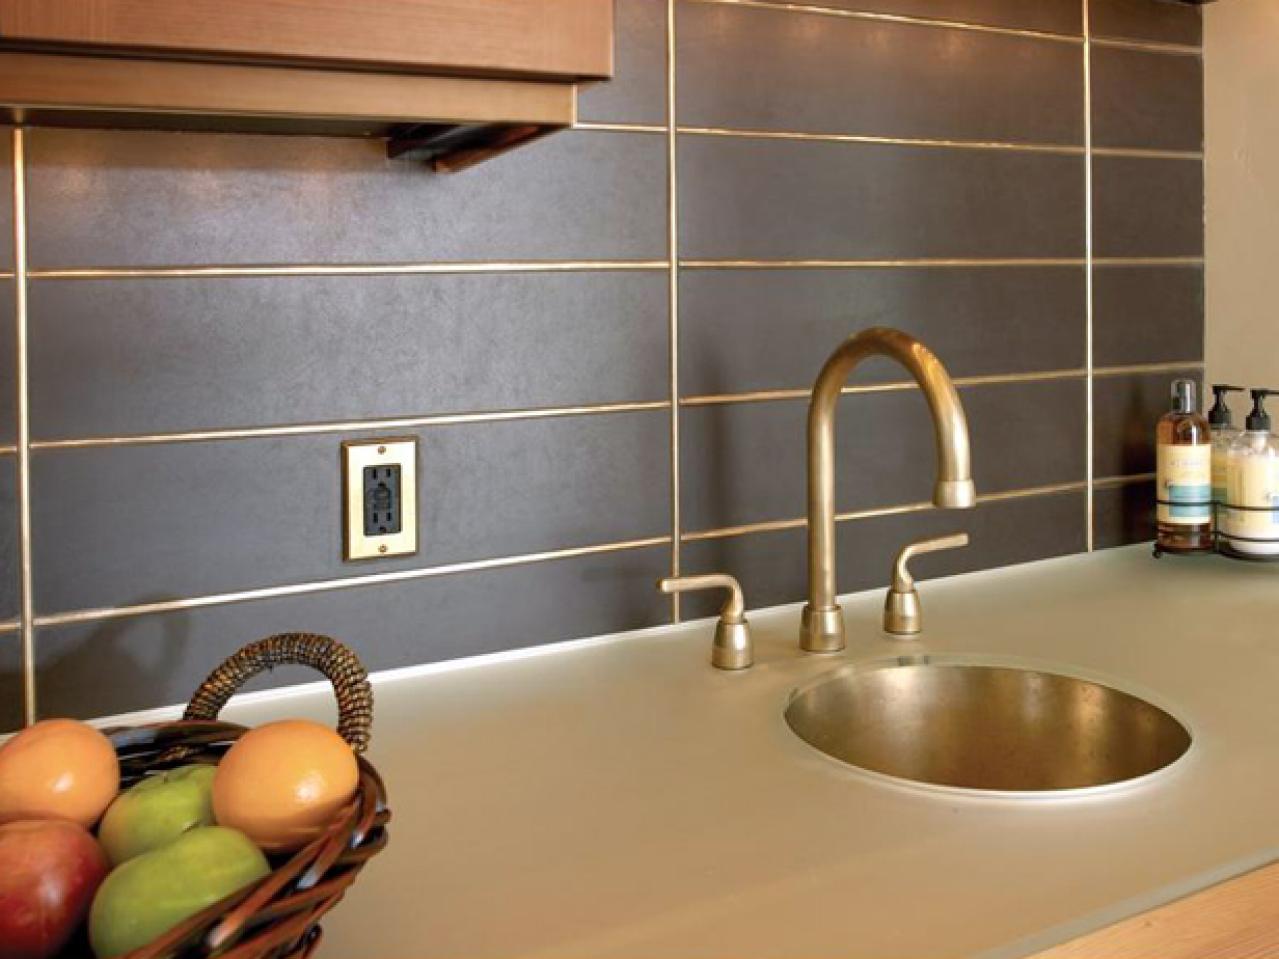 original_metal-backsplashes-bronze-tiles_s4x3-jpg-rend-hgtvcom-1280-960